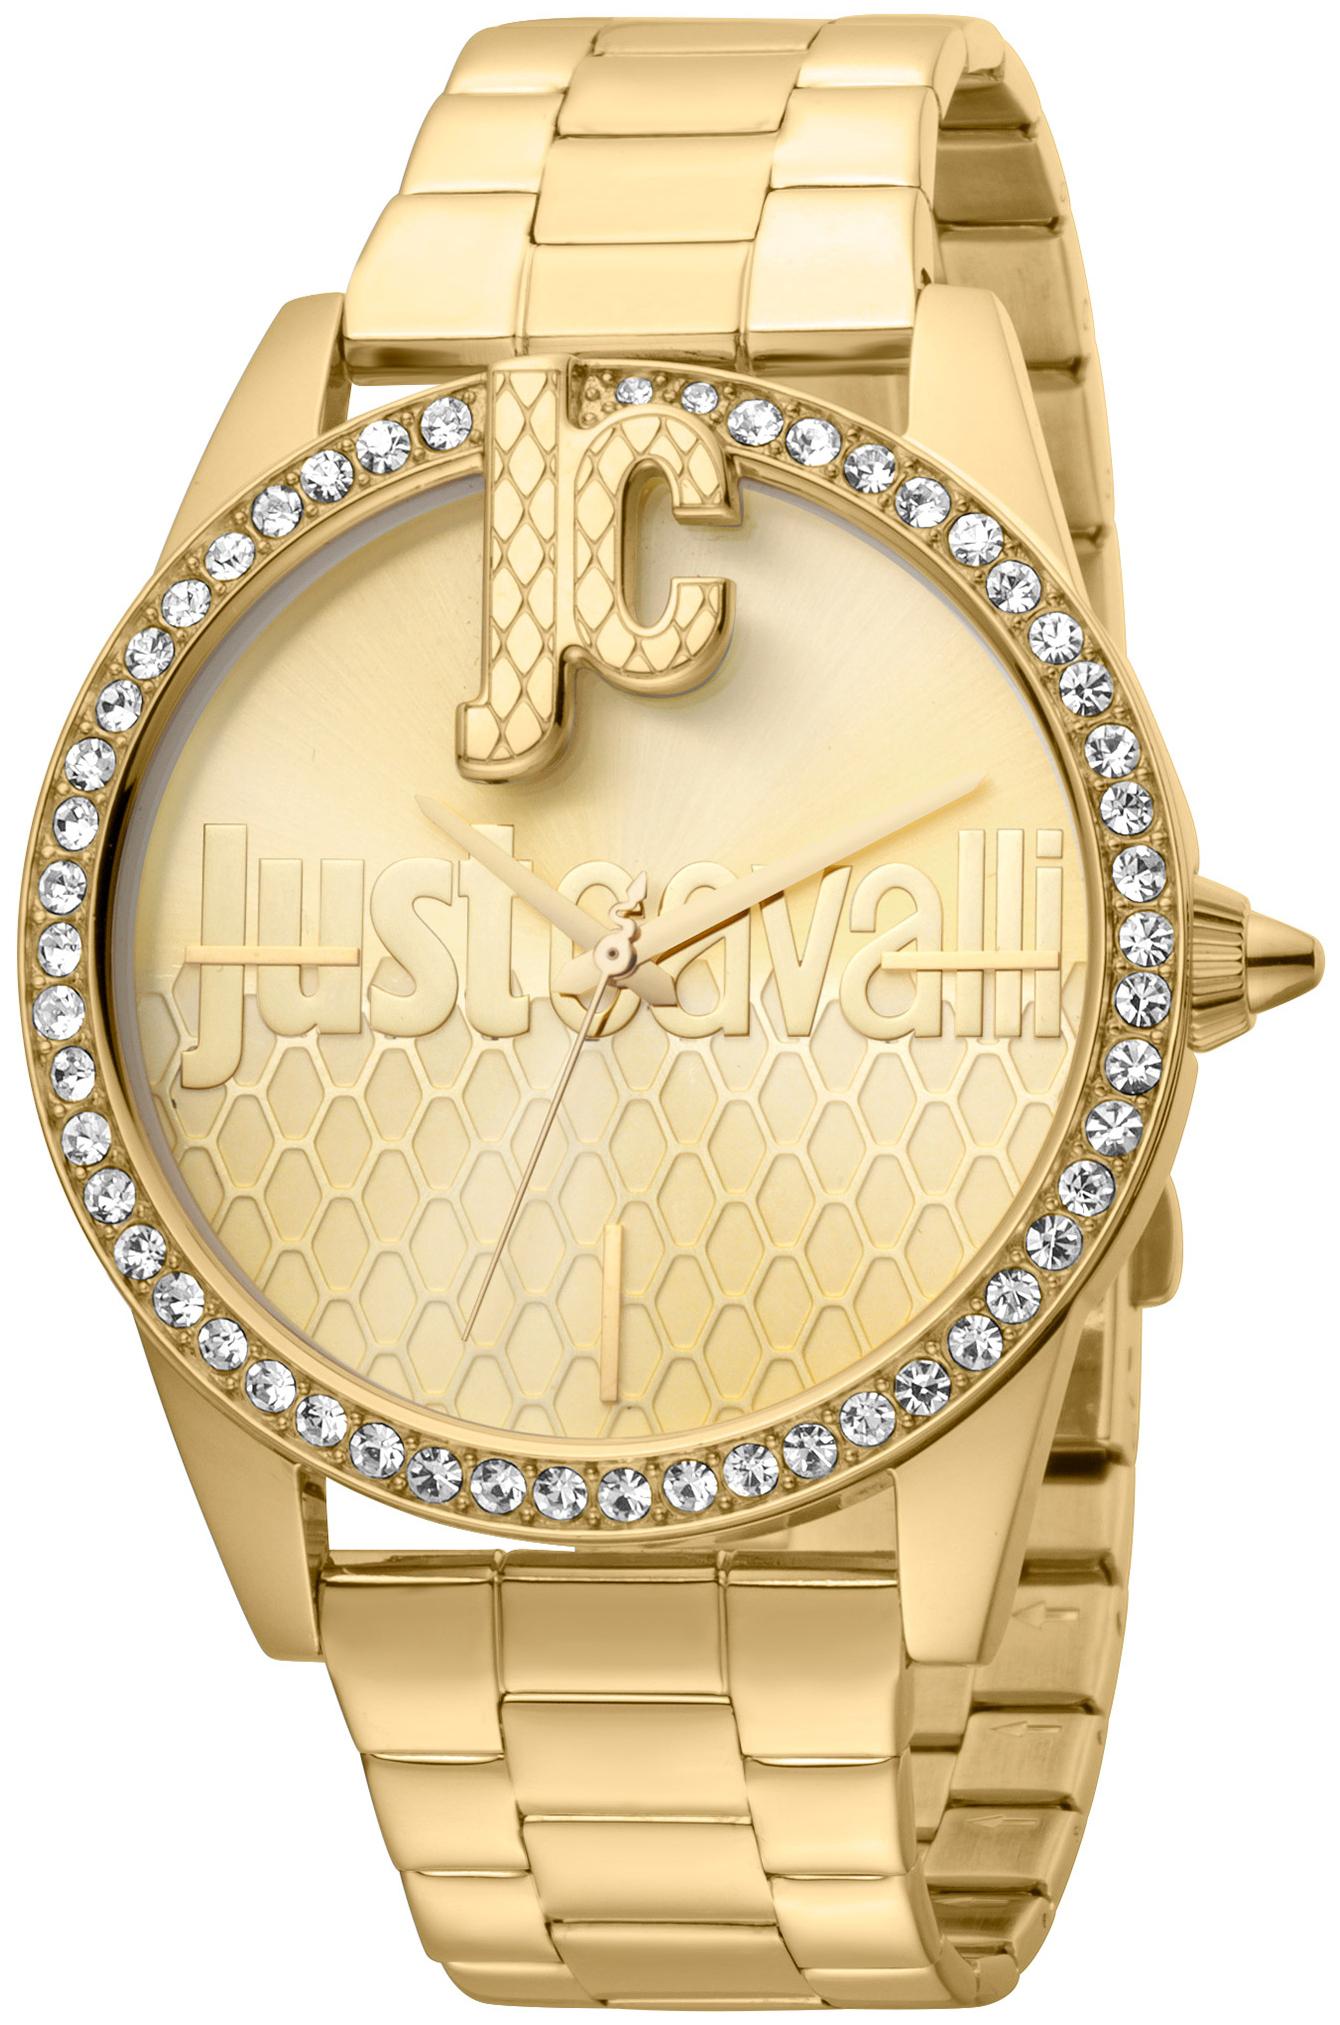 Just Cavalli Logo Dameur JC1L100M0085 Guldfarvet/Gul guldtonet stål